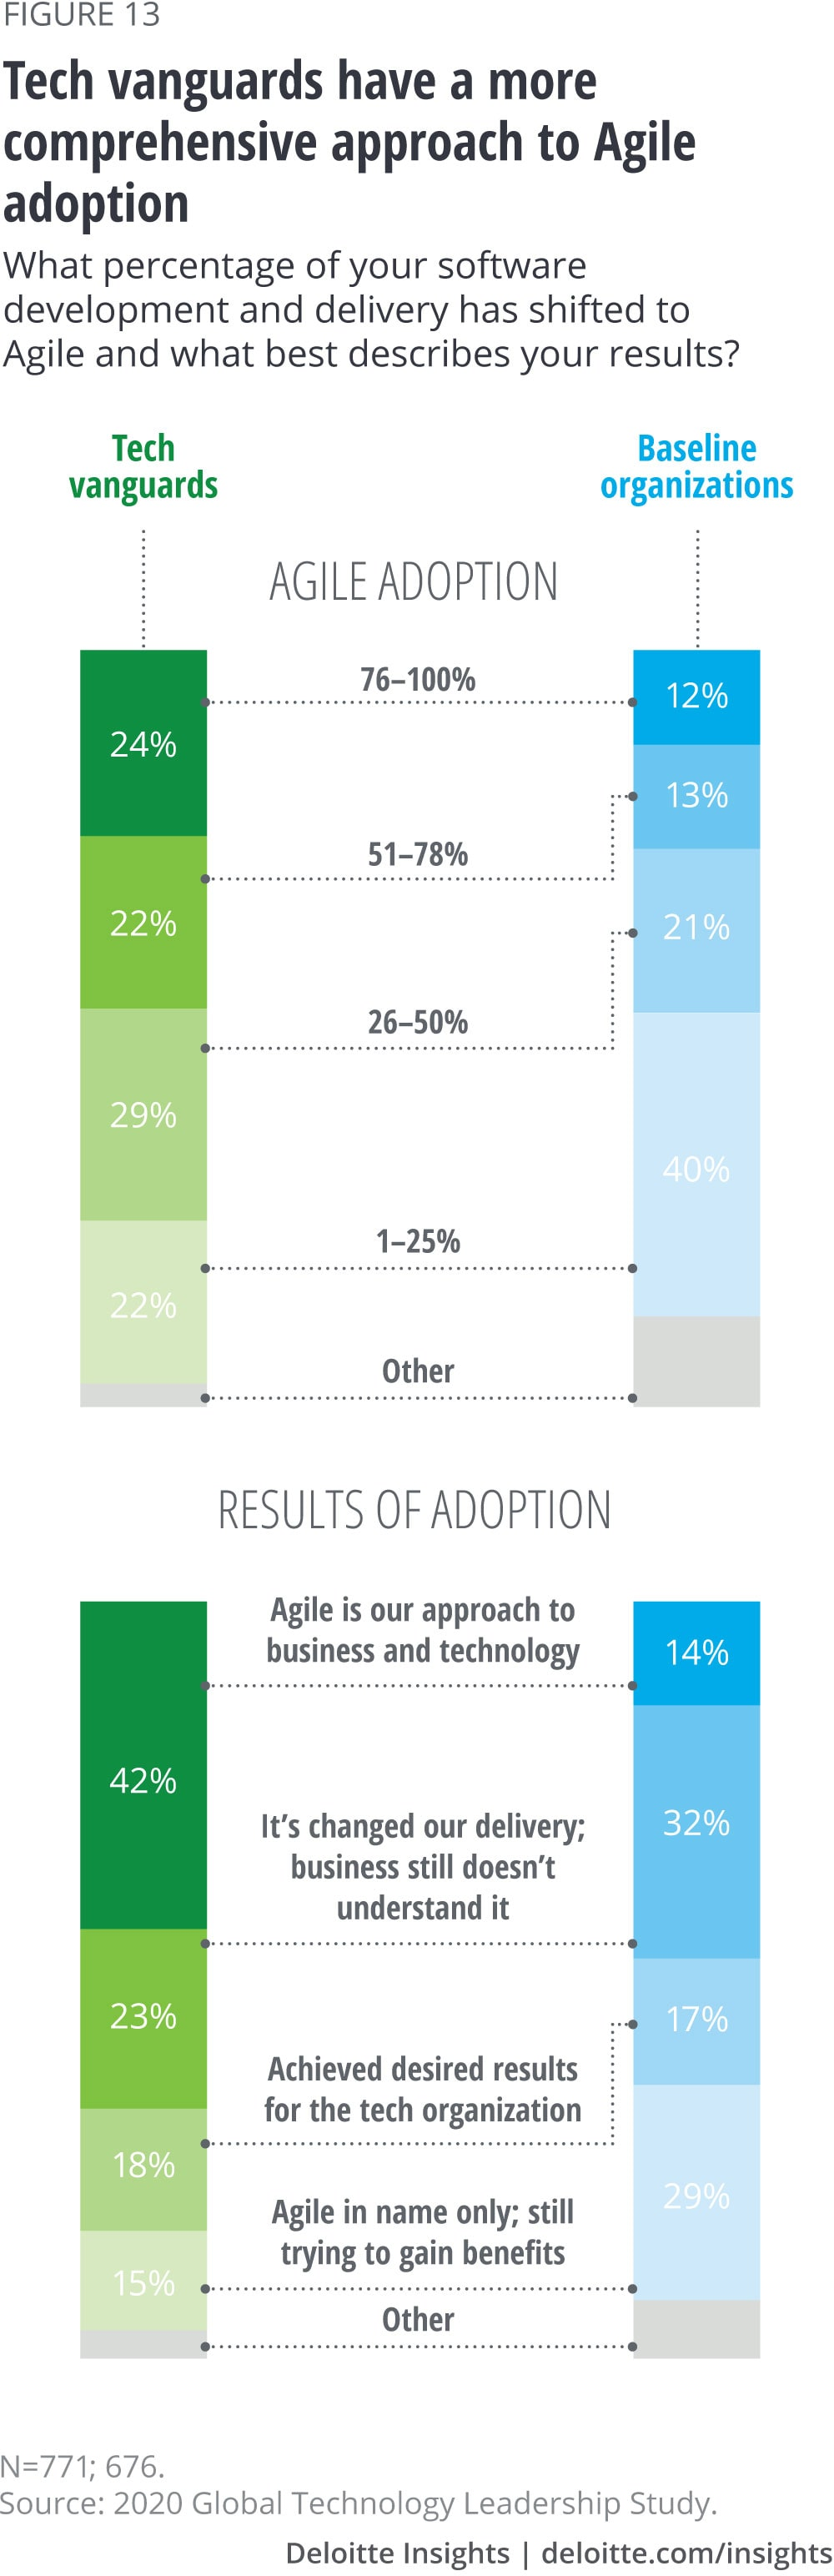 2020 Global Technology Leadership Study Deloitte Insights